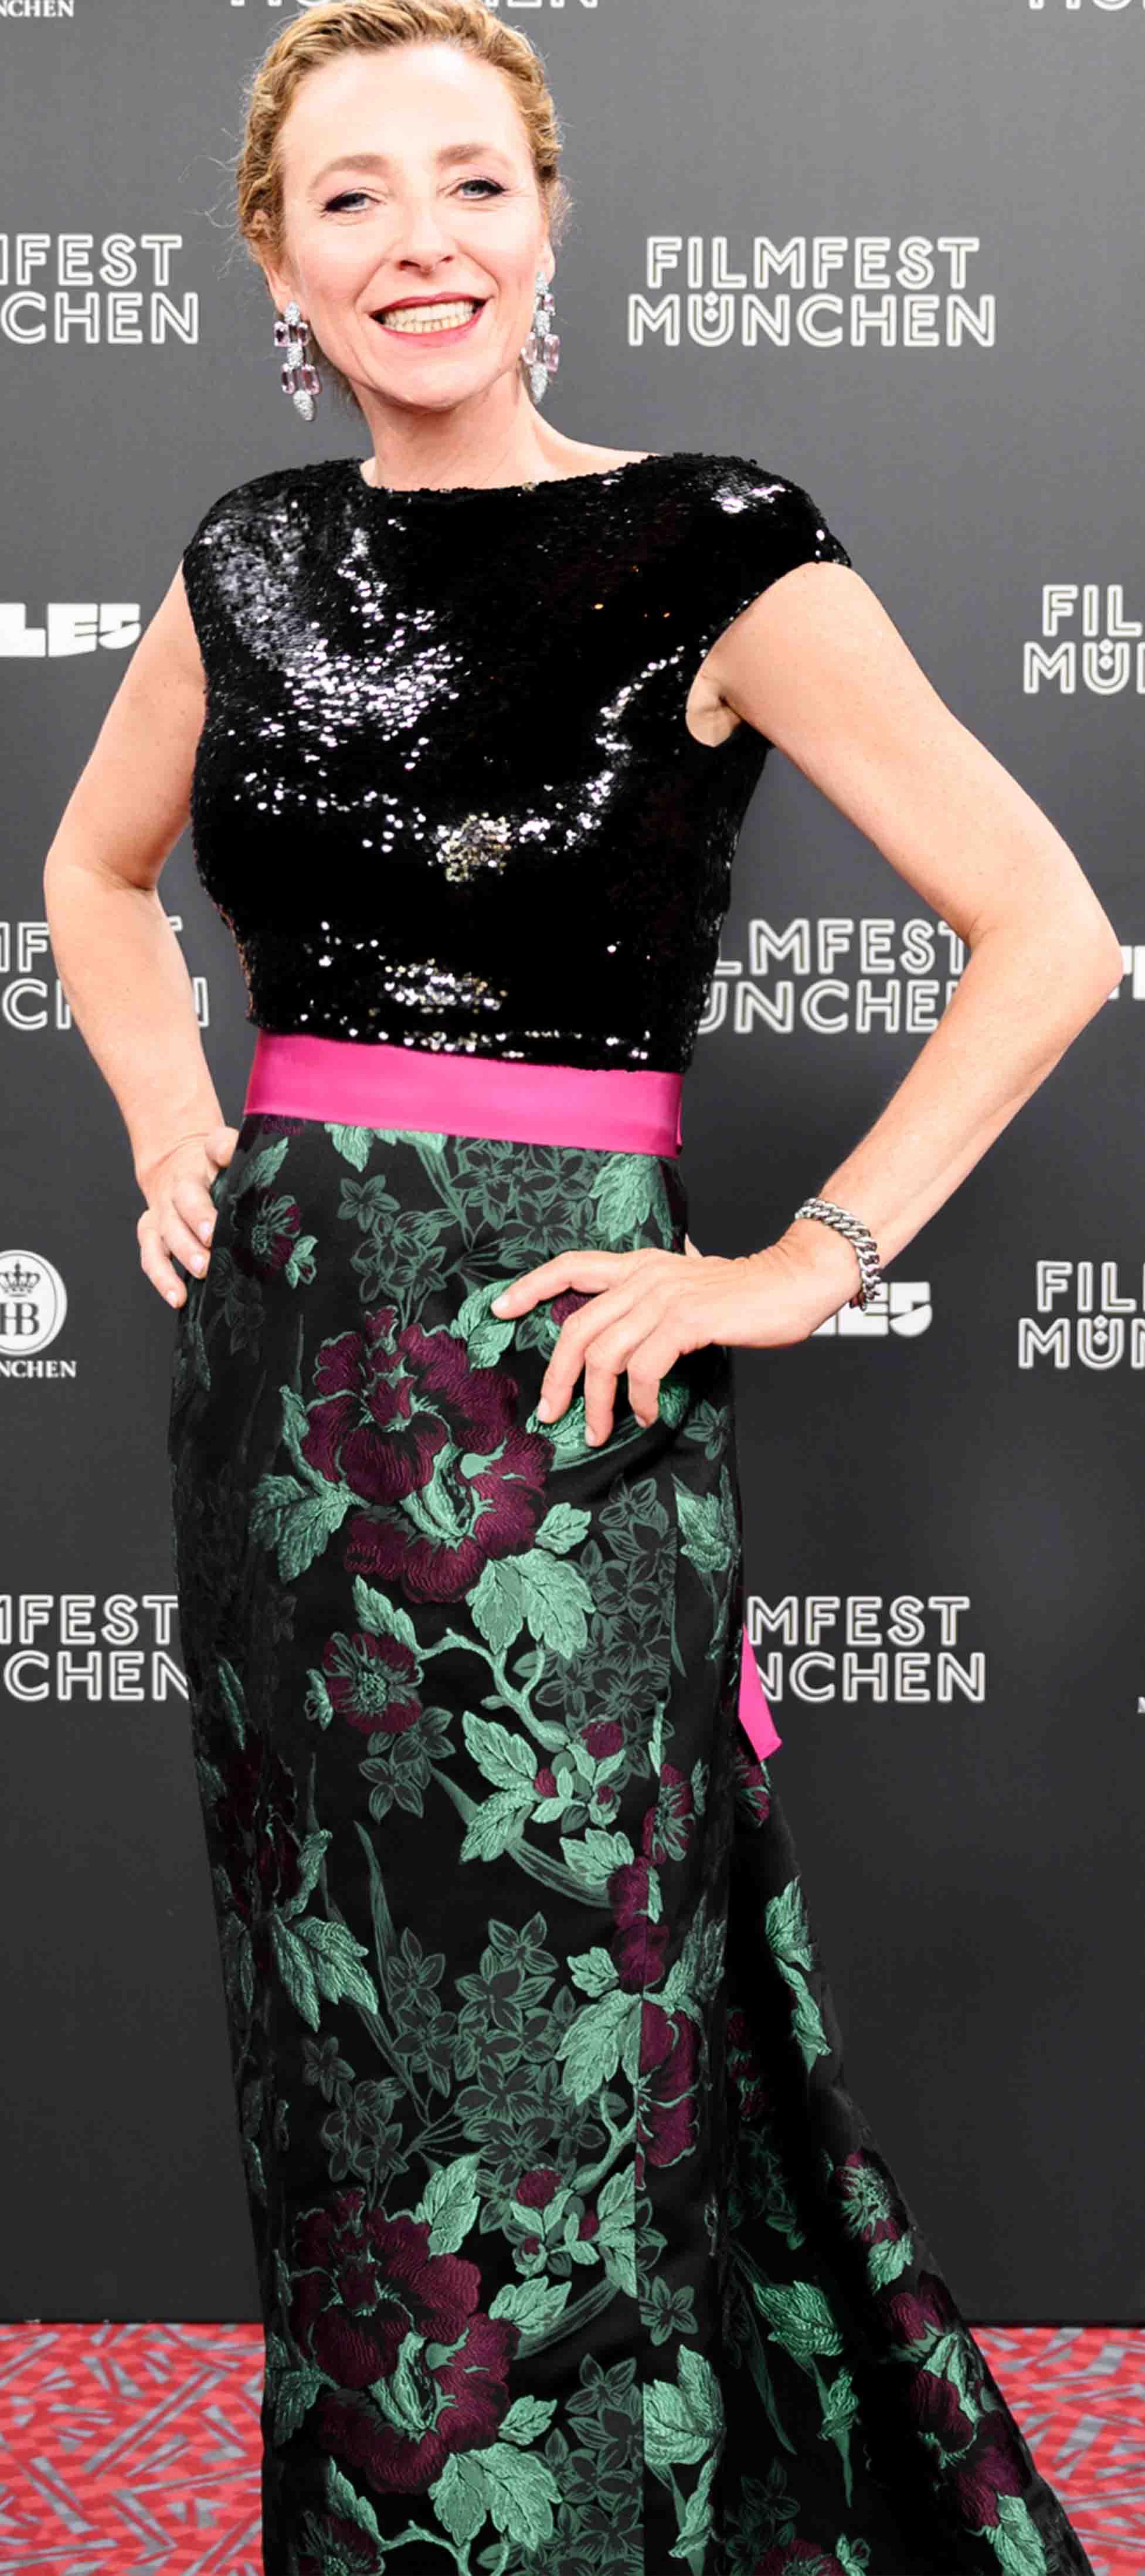 Diana Iljine, Filmfestchefin